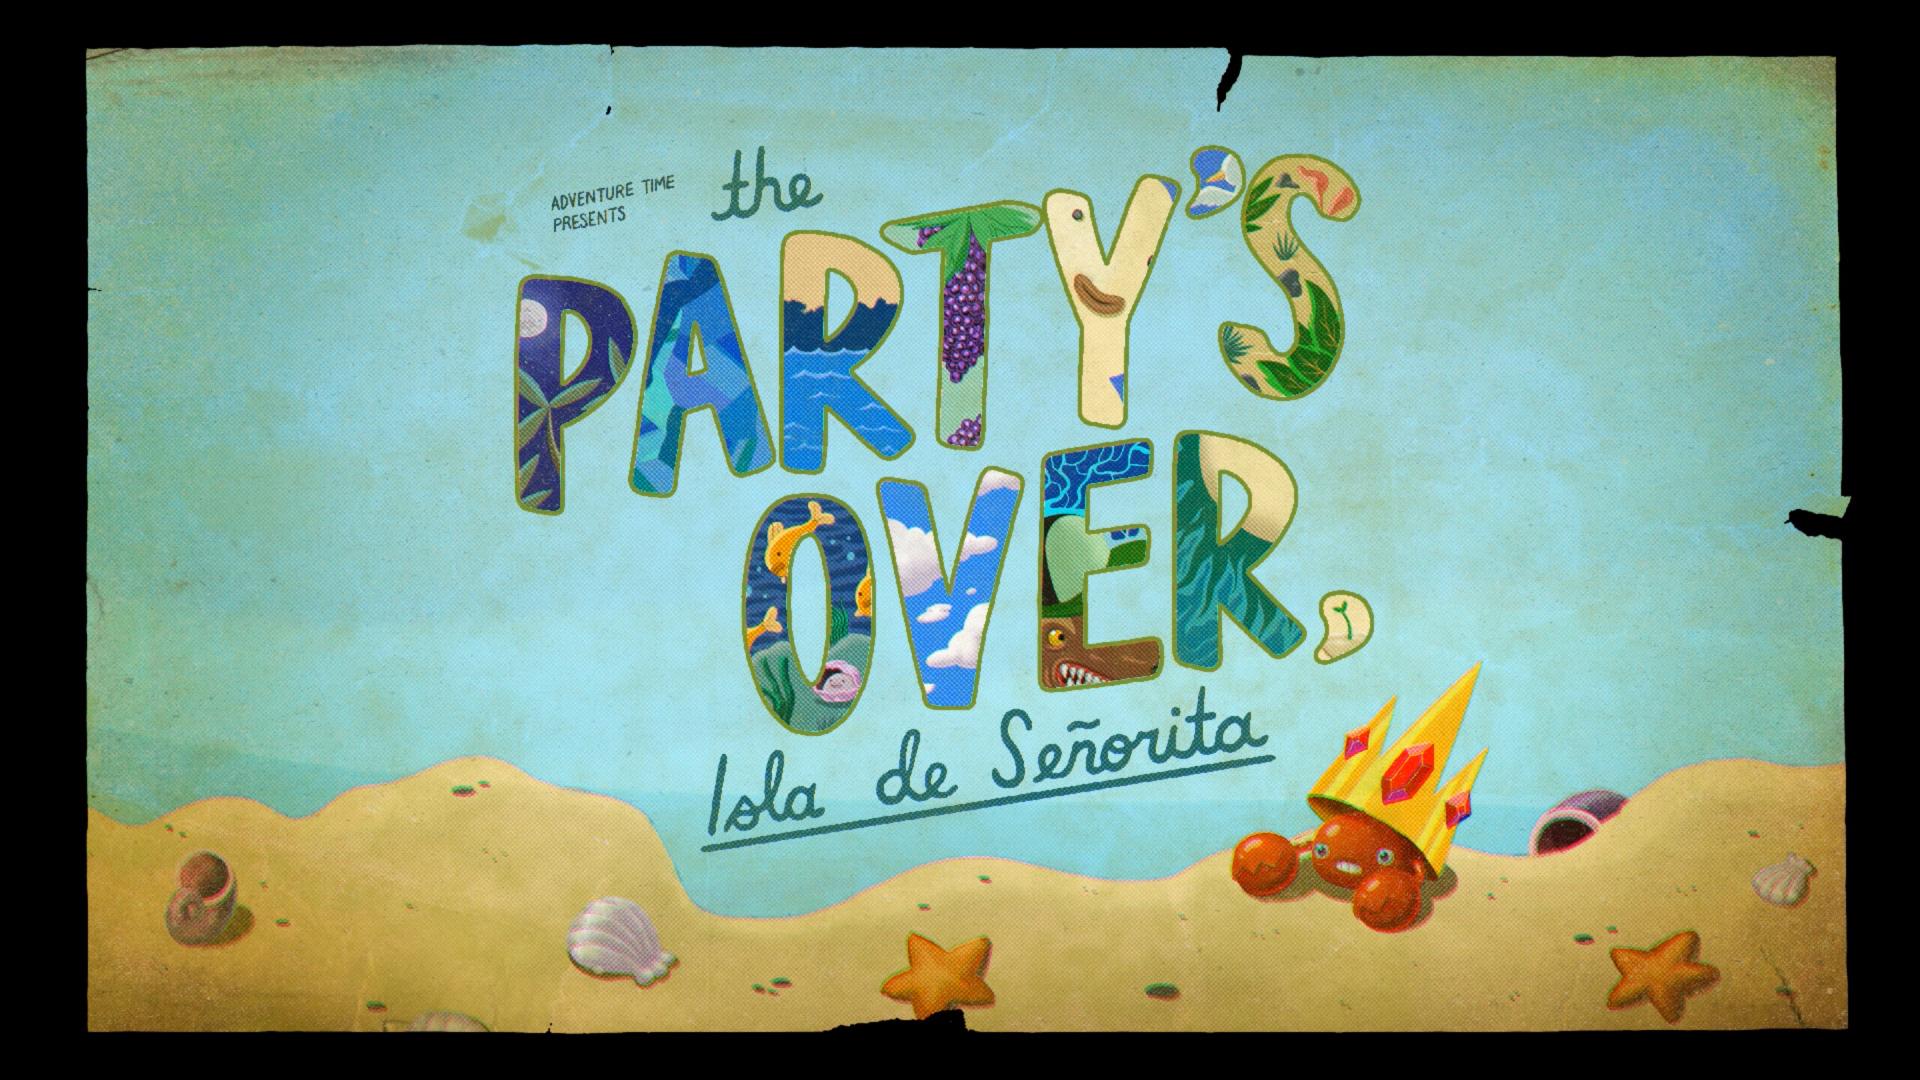 The Party's Over, Isla de Señorita   Adventure Time Wiki   FANDOM